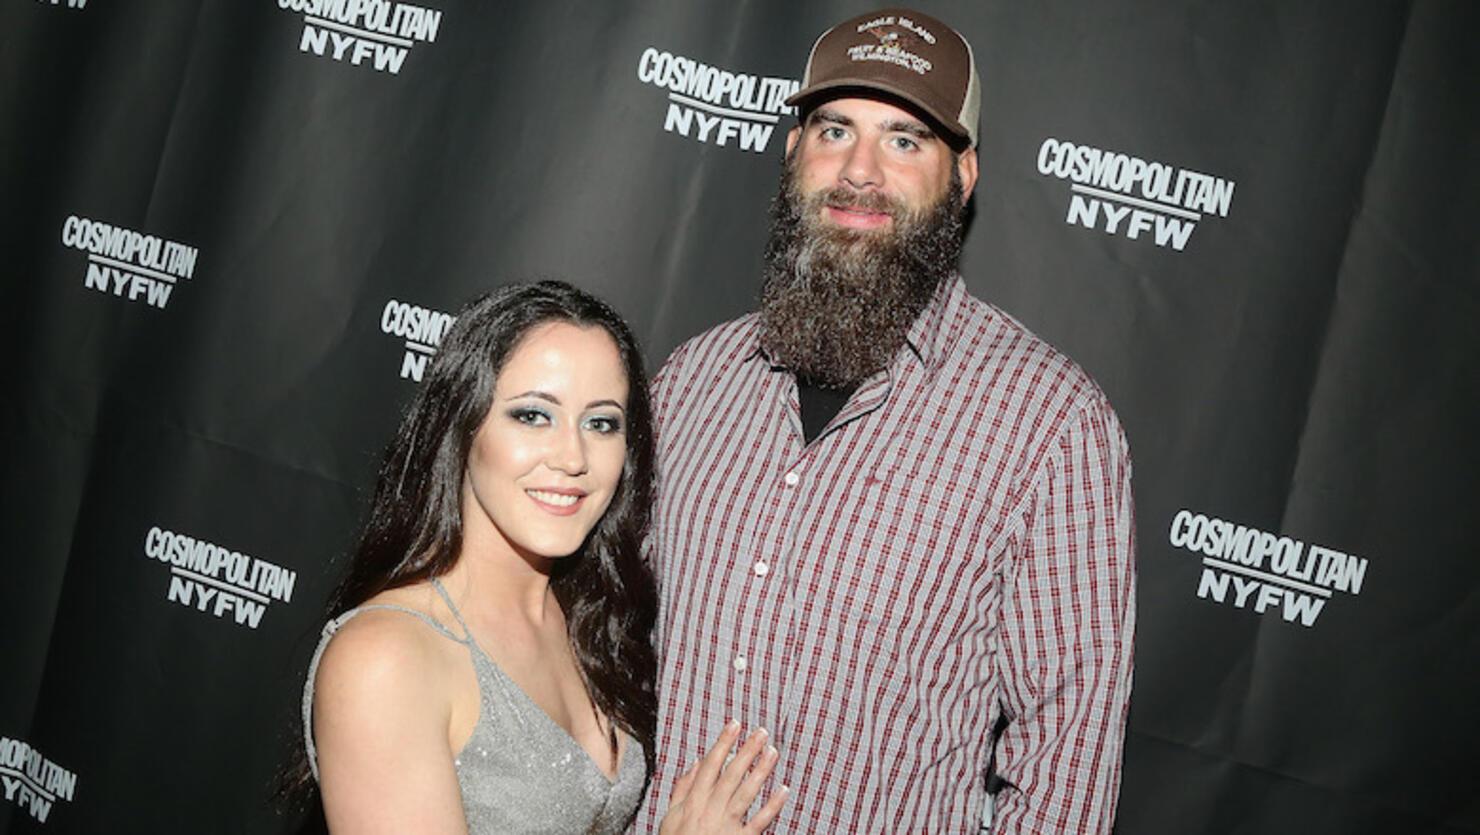 Jenelle Evans Husband David Eason Loses Custody of Son